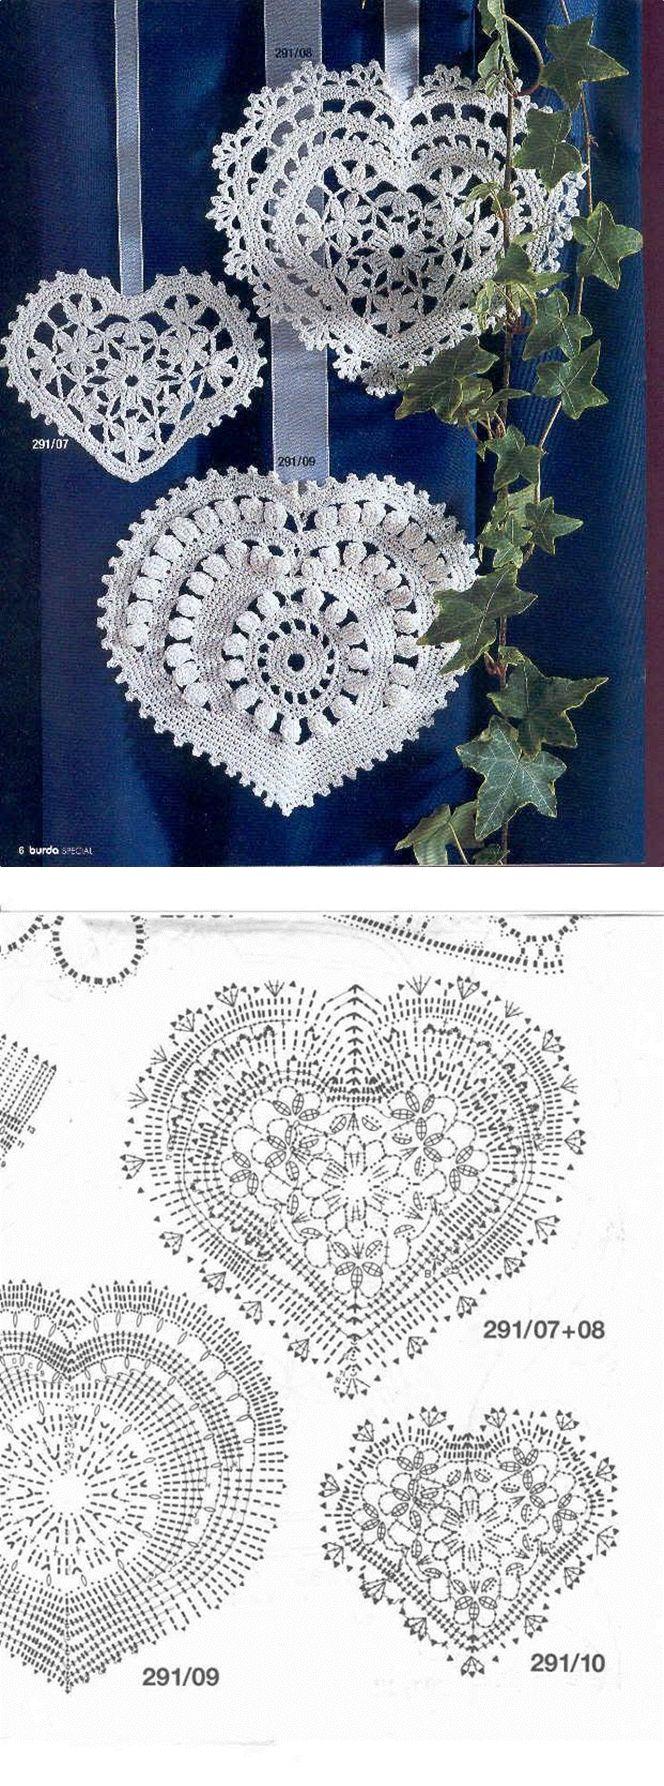 crochet hearts | horgolt szív | Pinterest | Ganchillo, Mandalas y ...